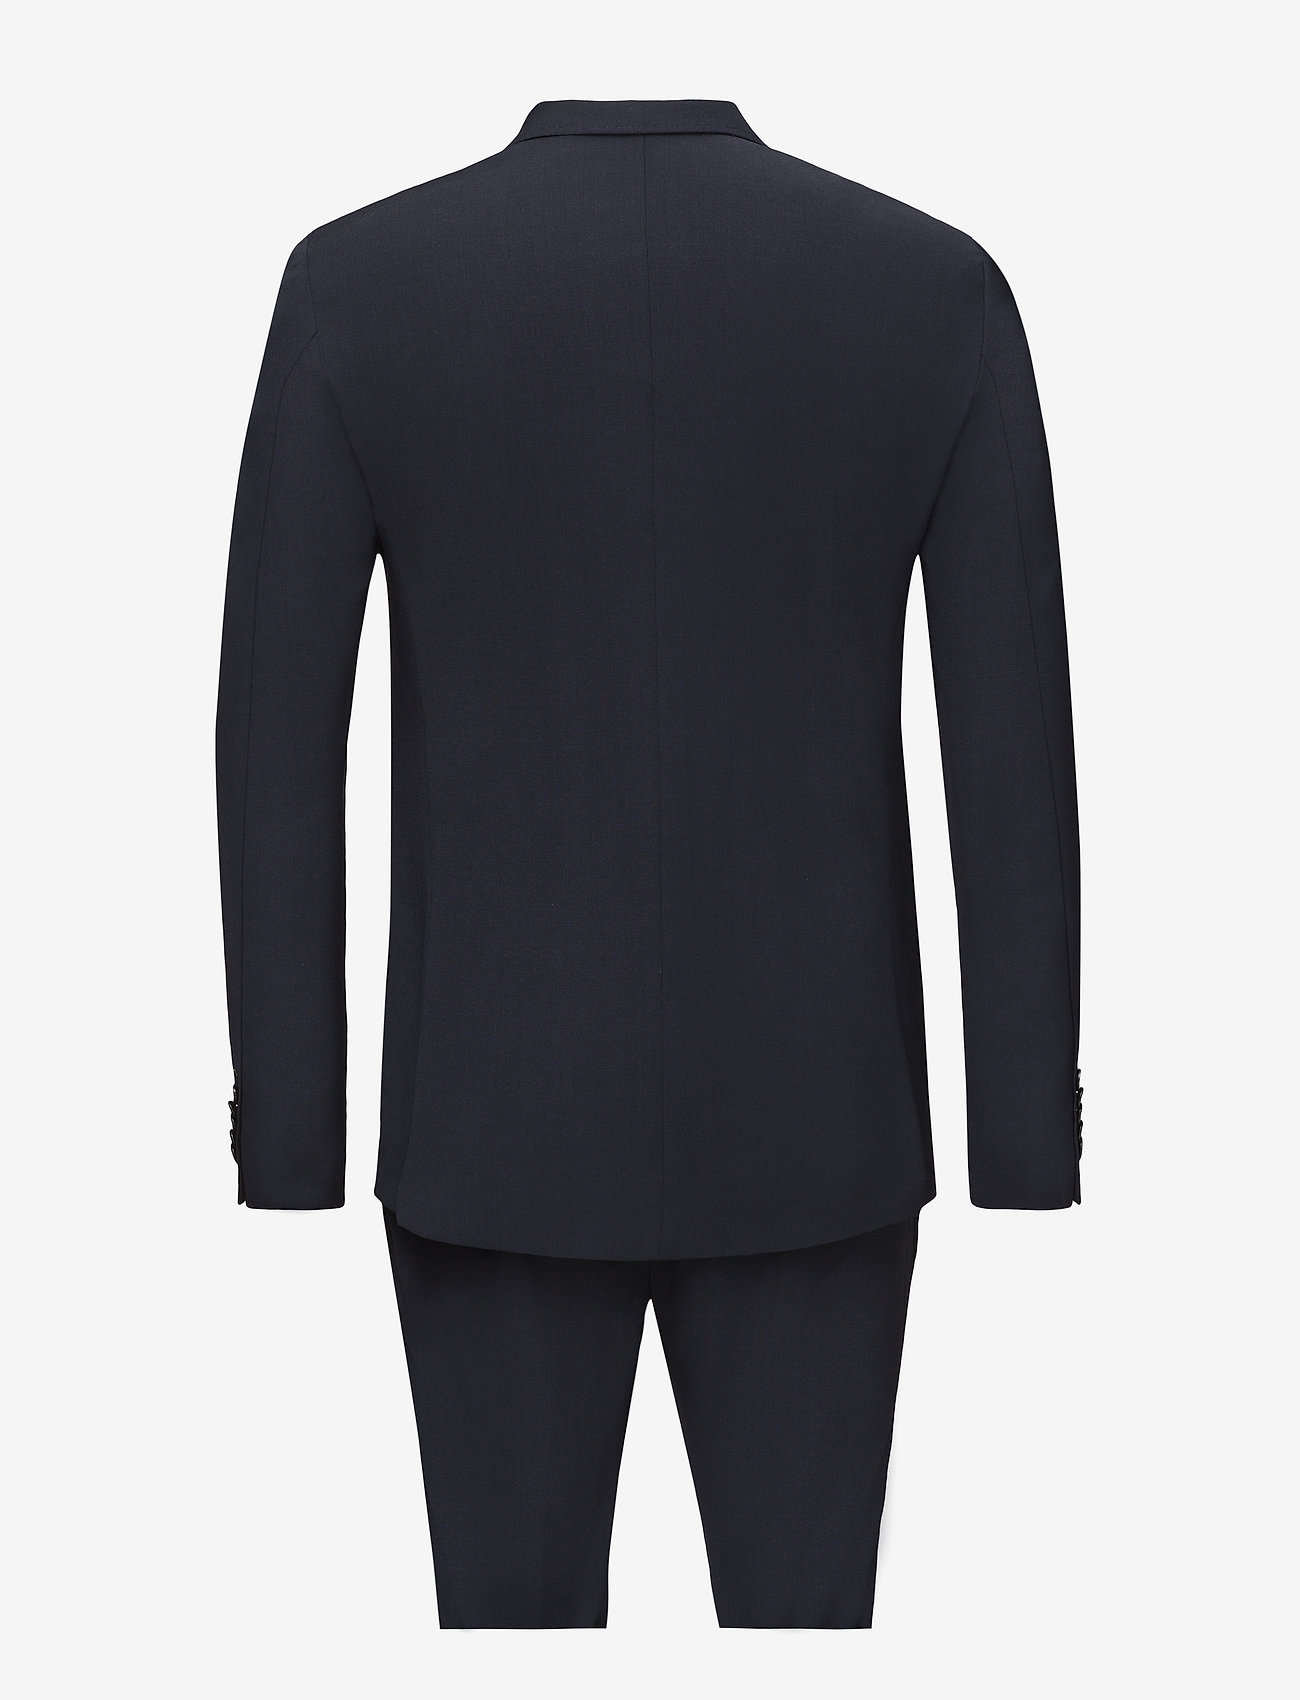 Bertoni - Davidsen-Ravn - single breasted suits - 744 blueprint - 1